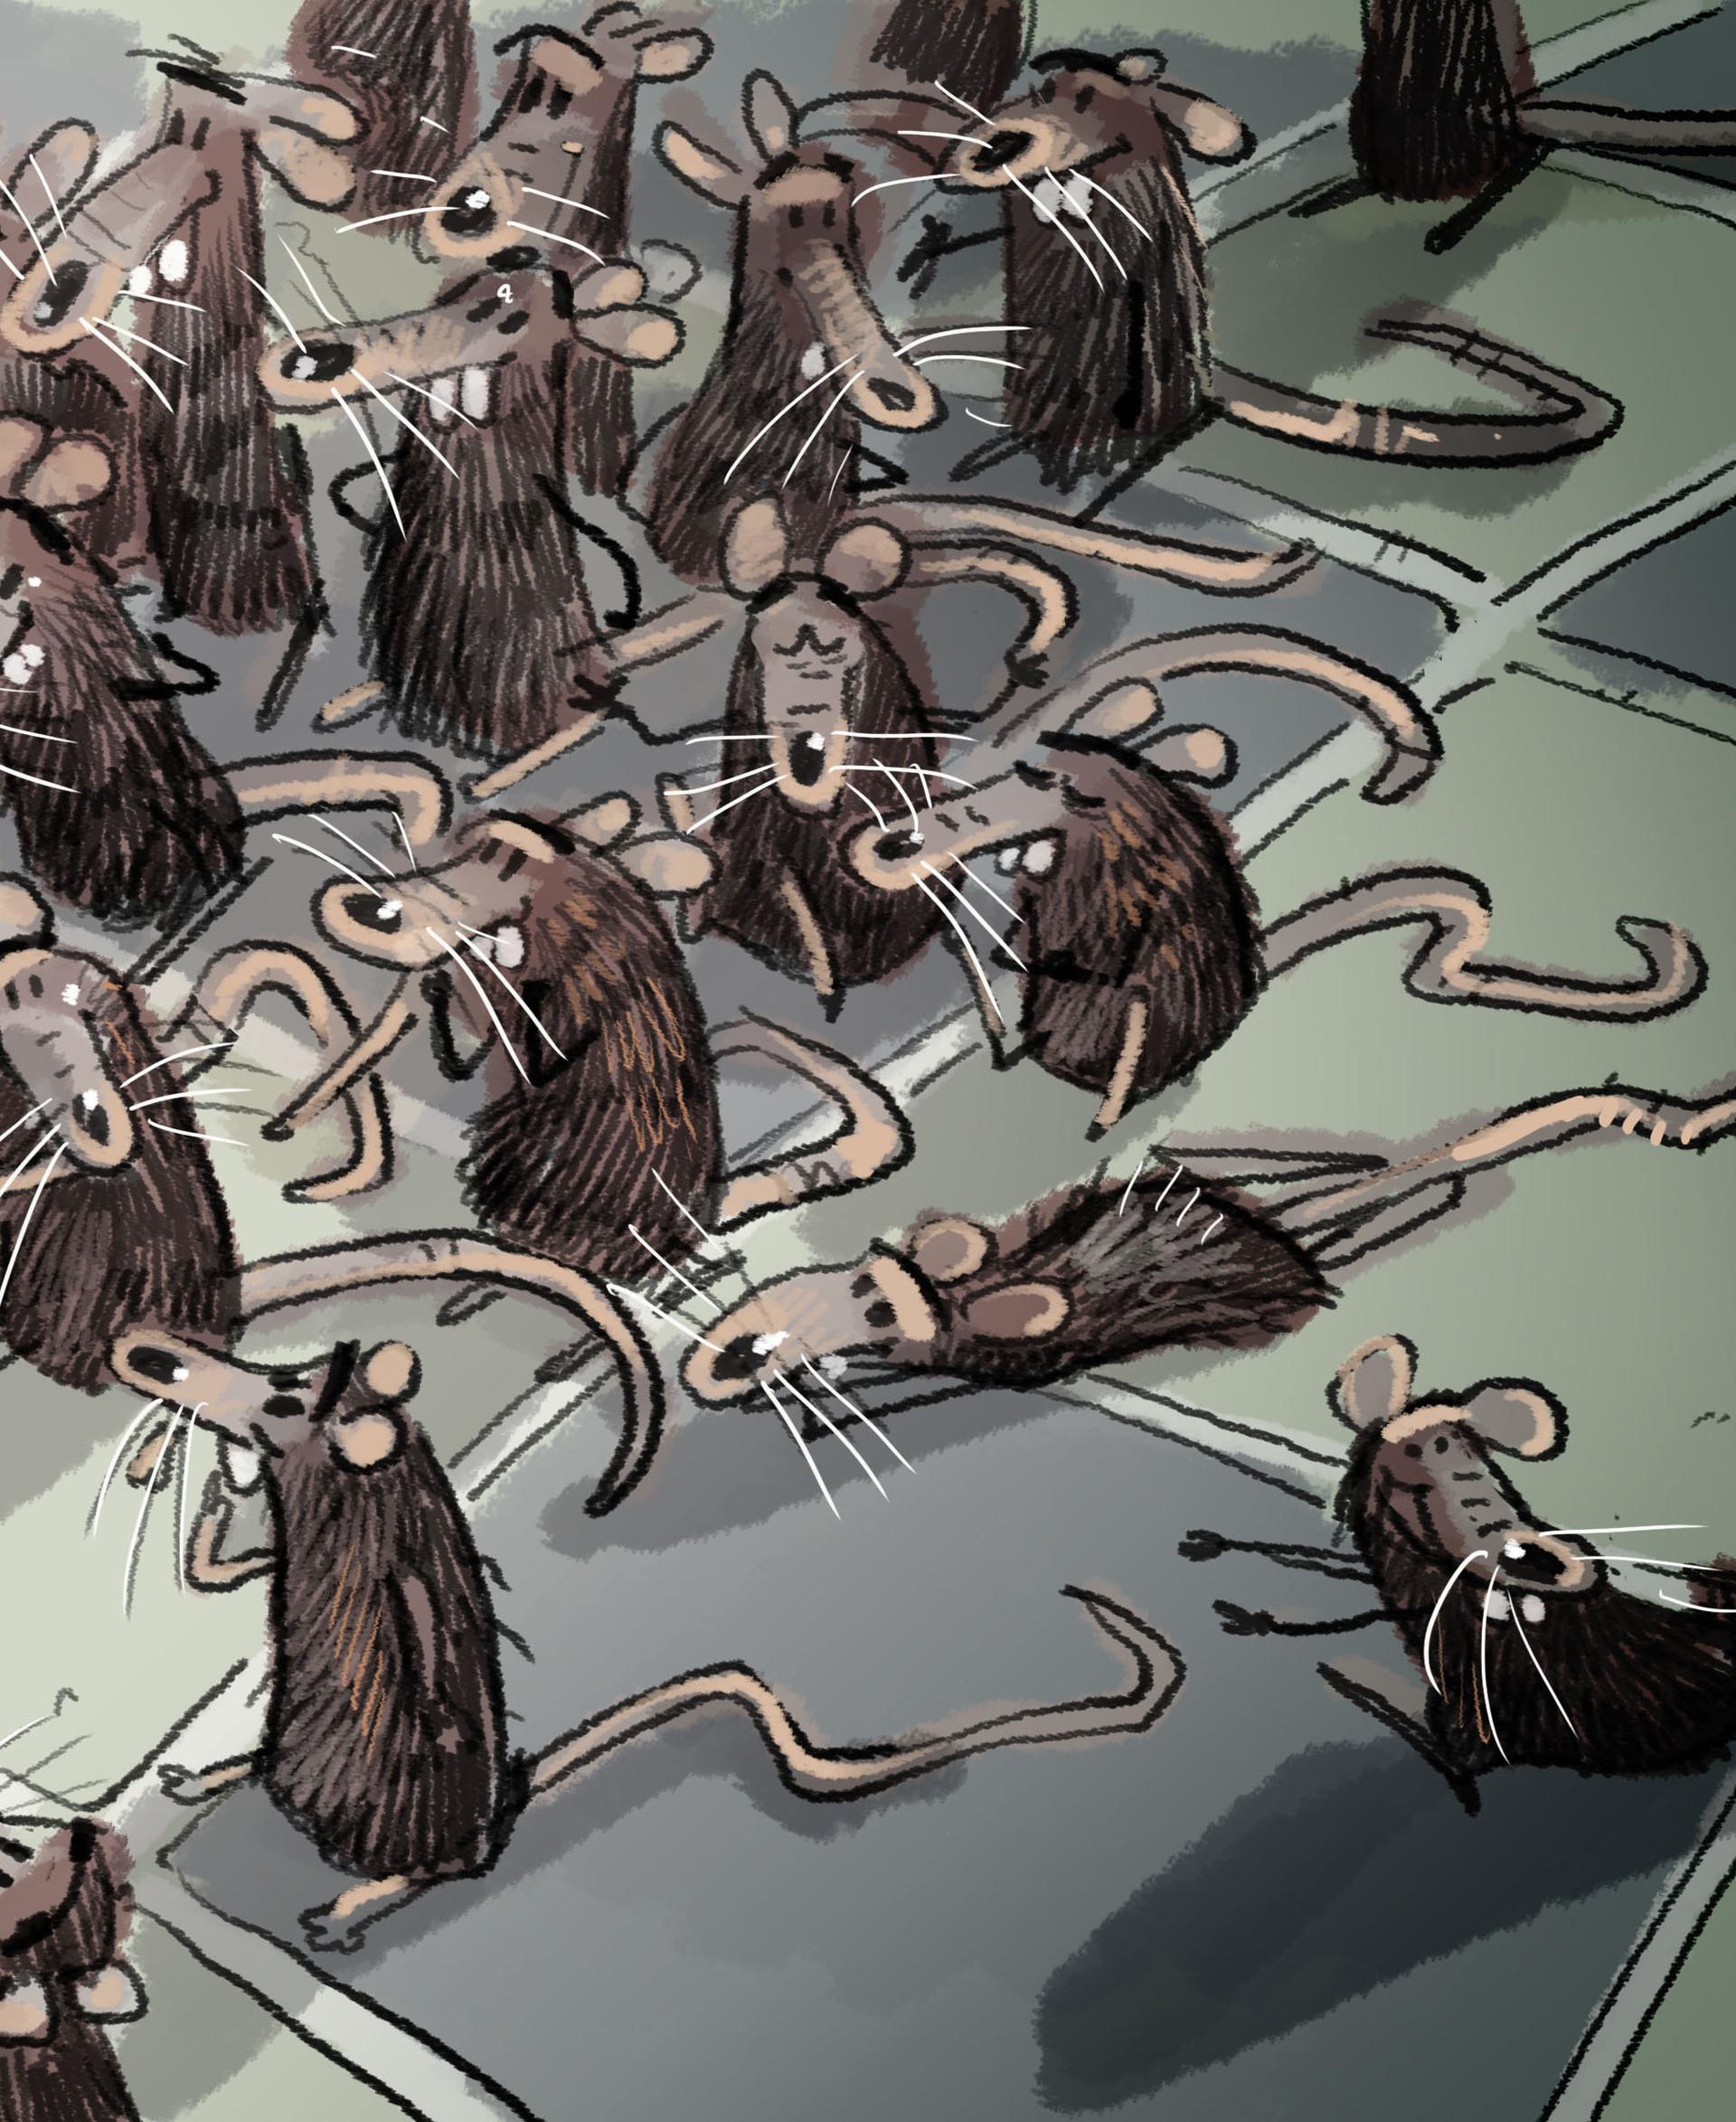 Guillermo casas ratones2